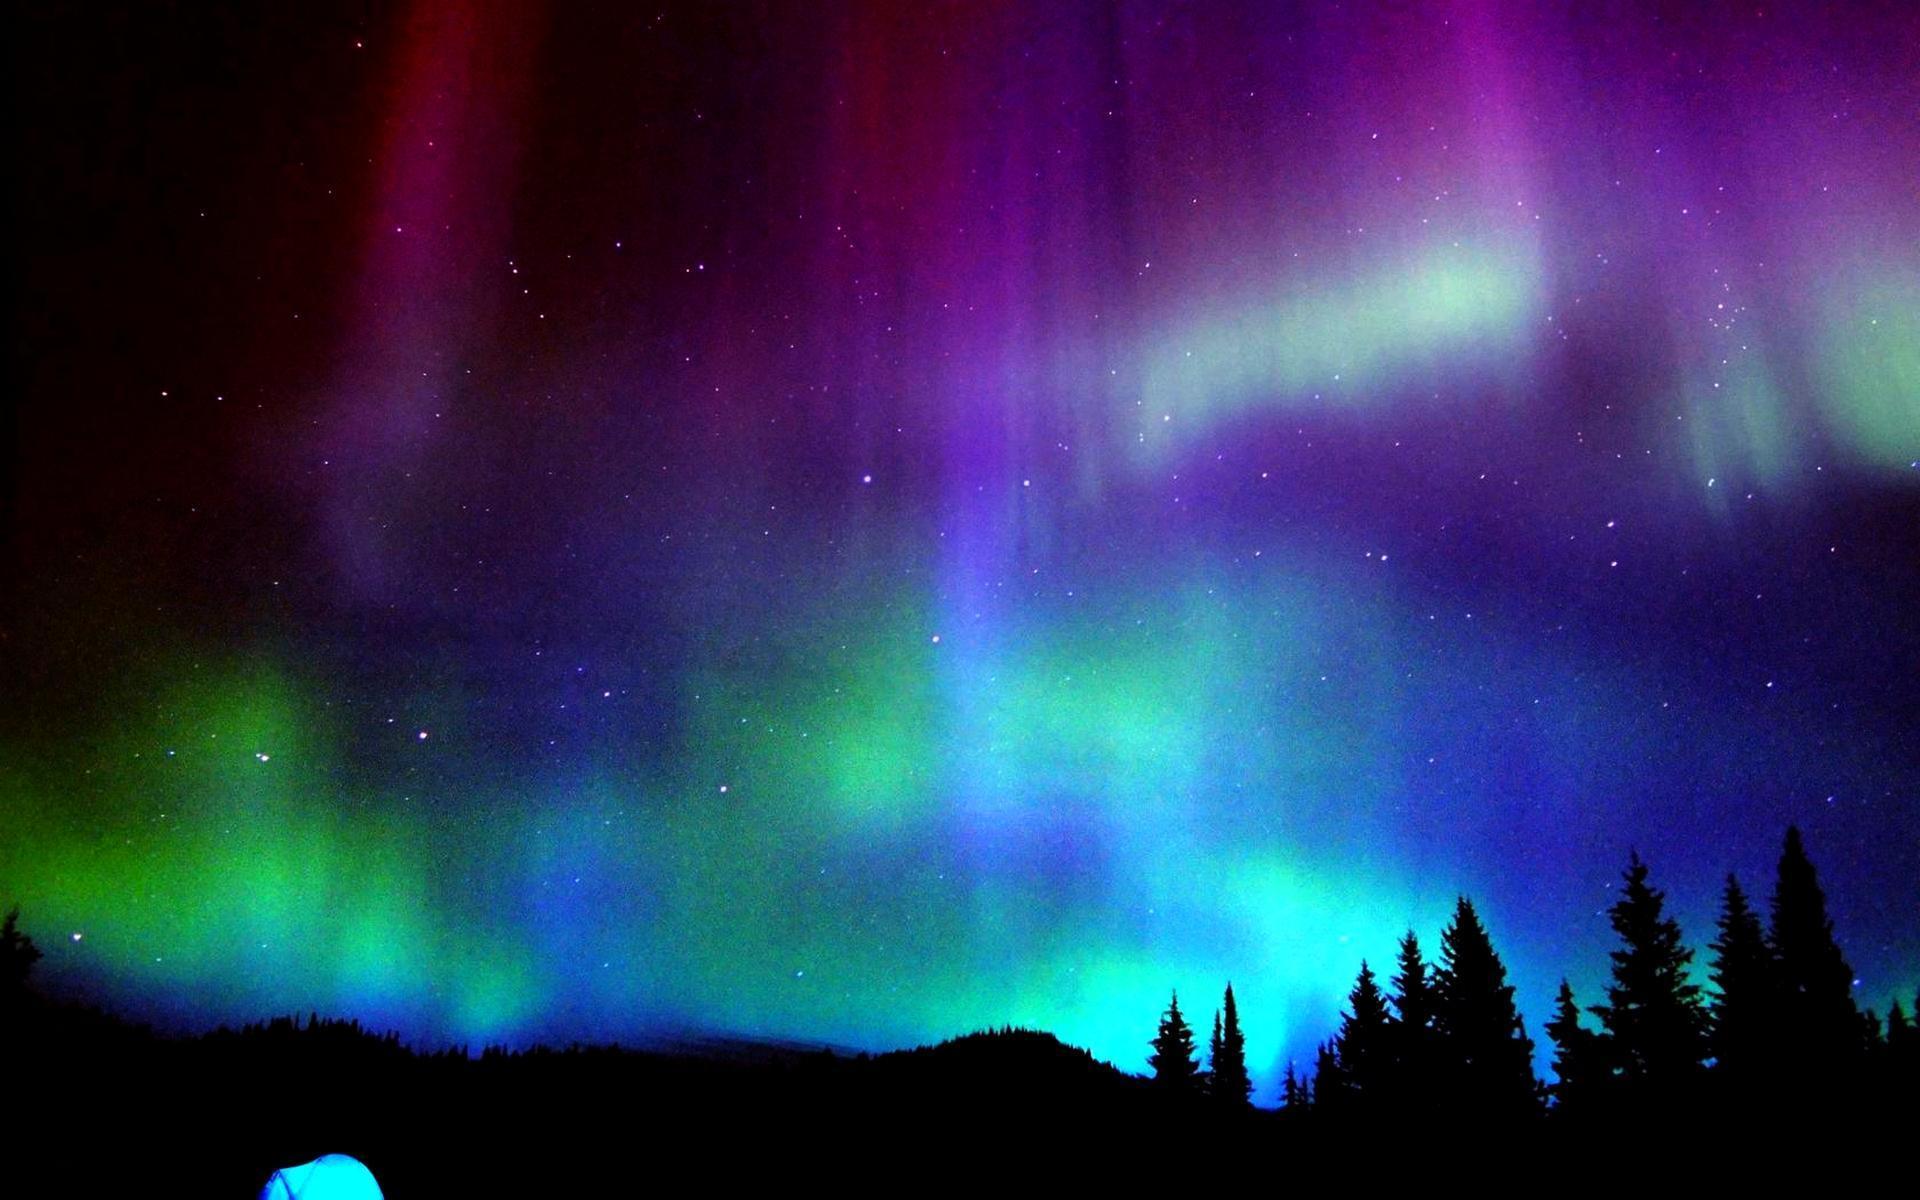 Aurora Borealis Backgrounds - Wallpaper Cave